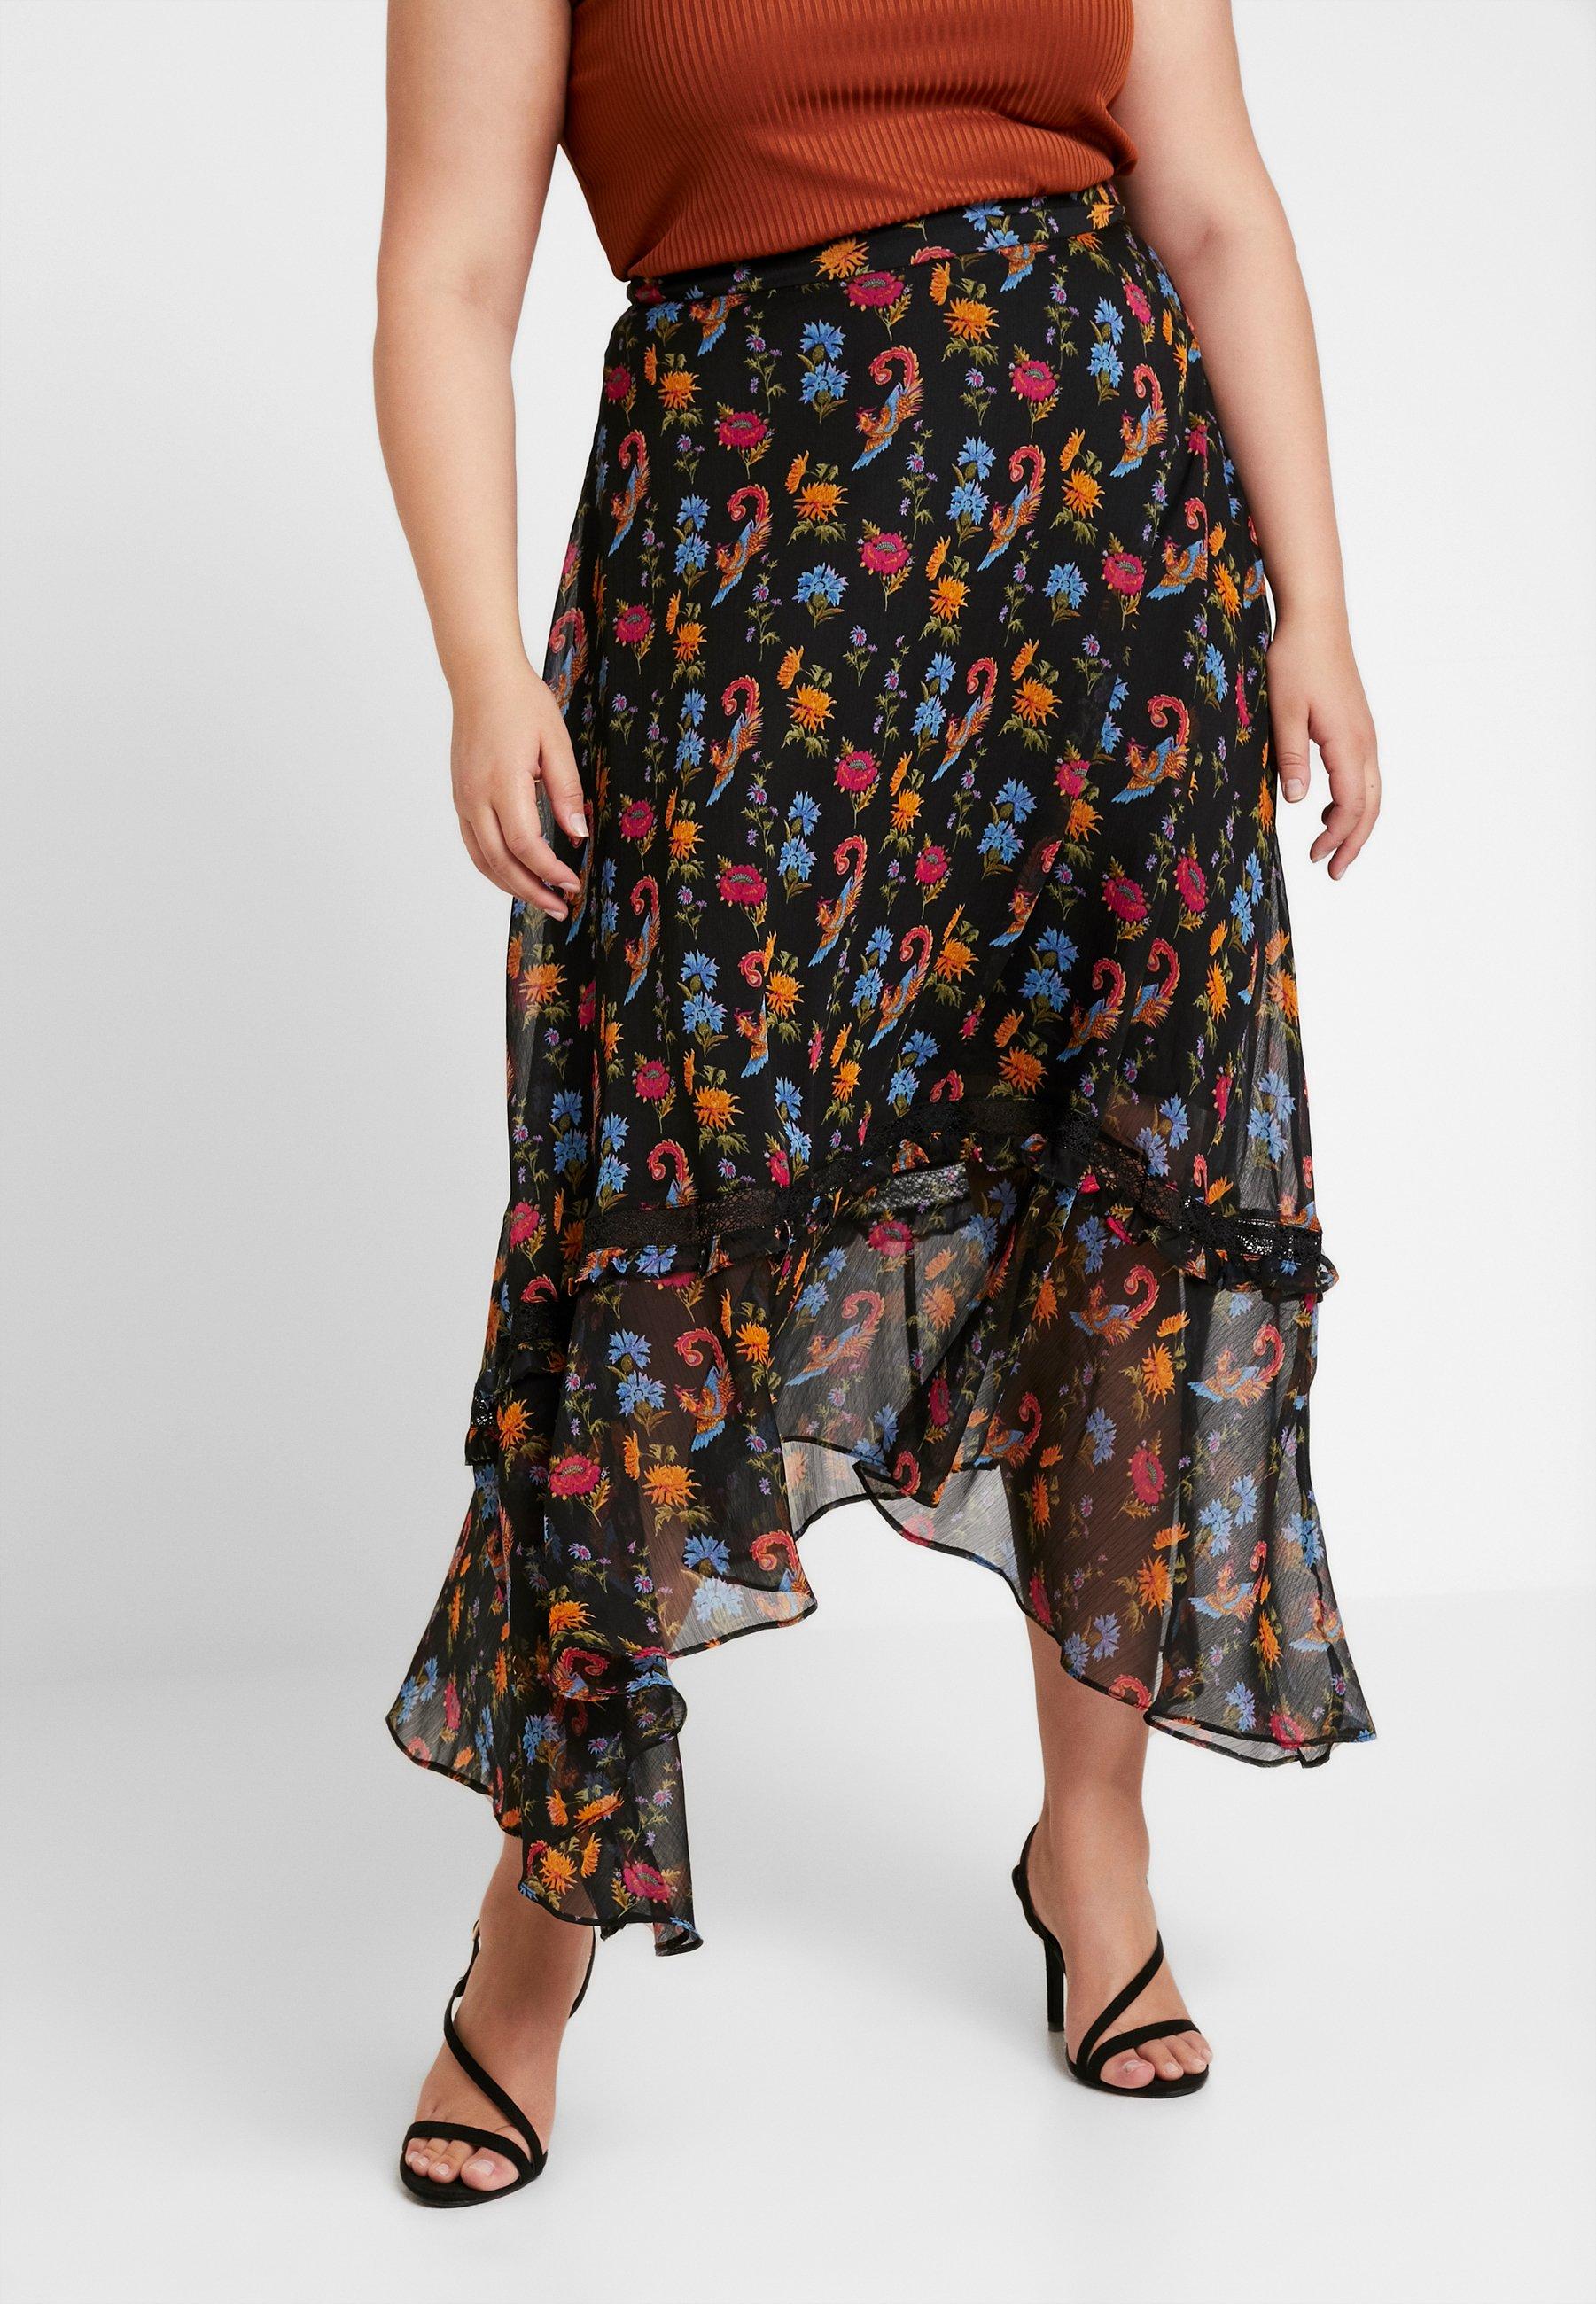 Curve Black SkirtJupe Glamorous Longue hrCtQsdx